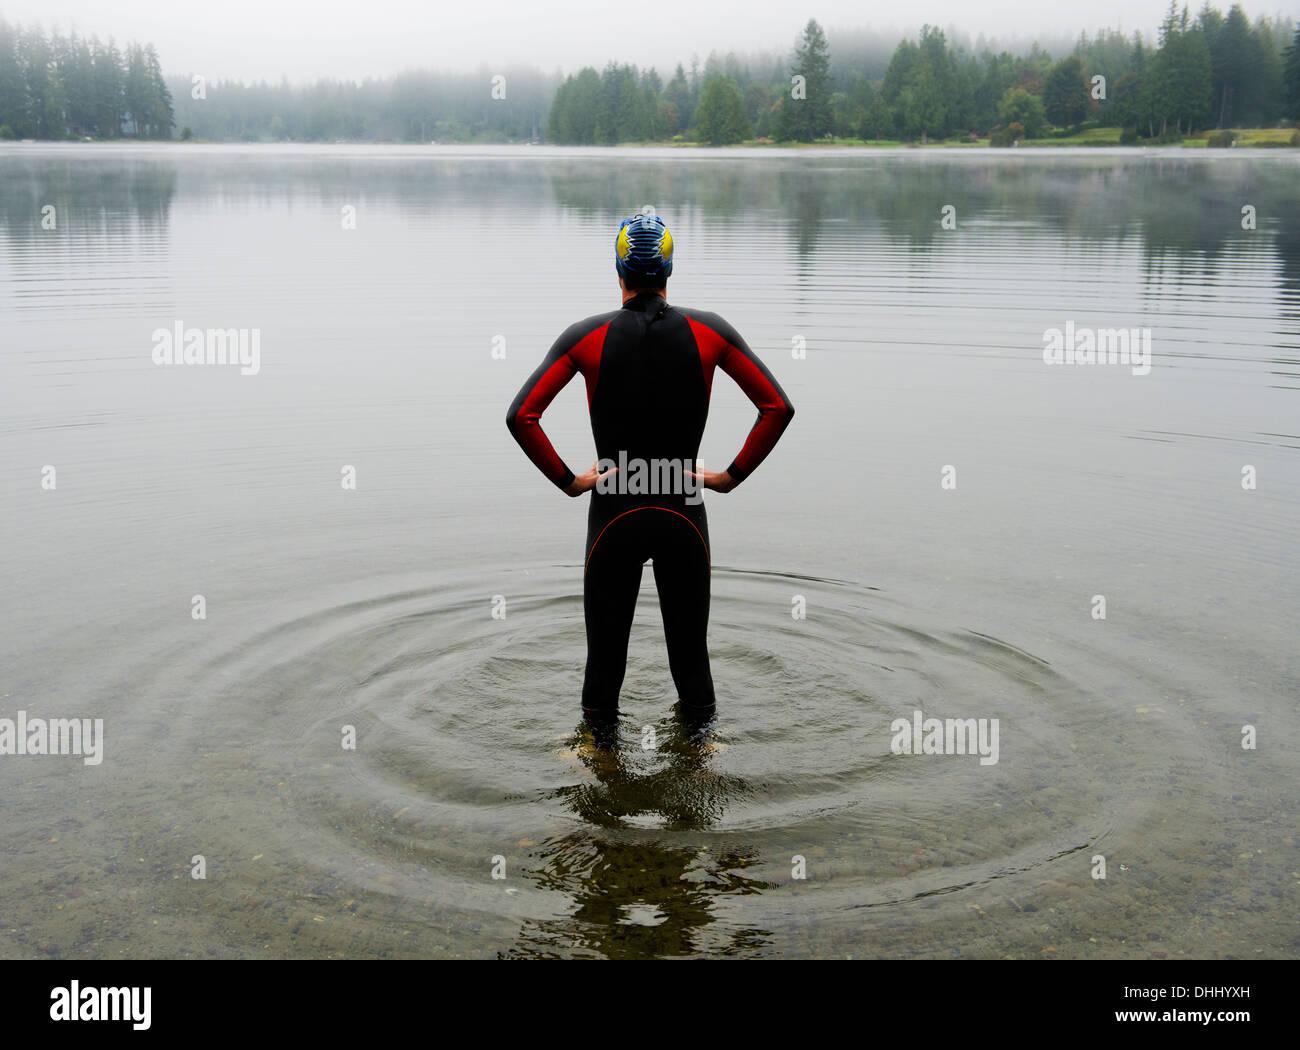 Joven en wet suit preparando para nadar lago Imagen De Stock